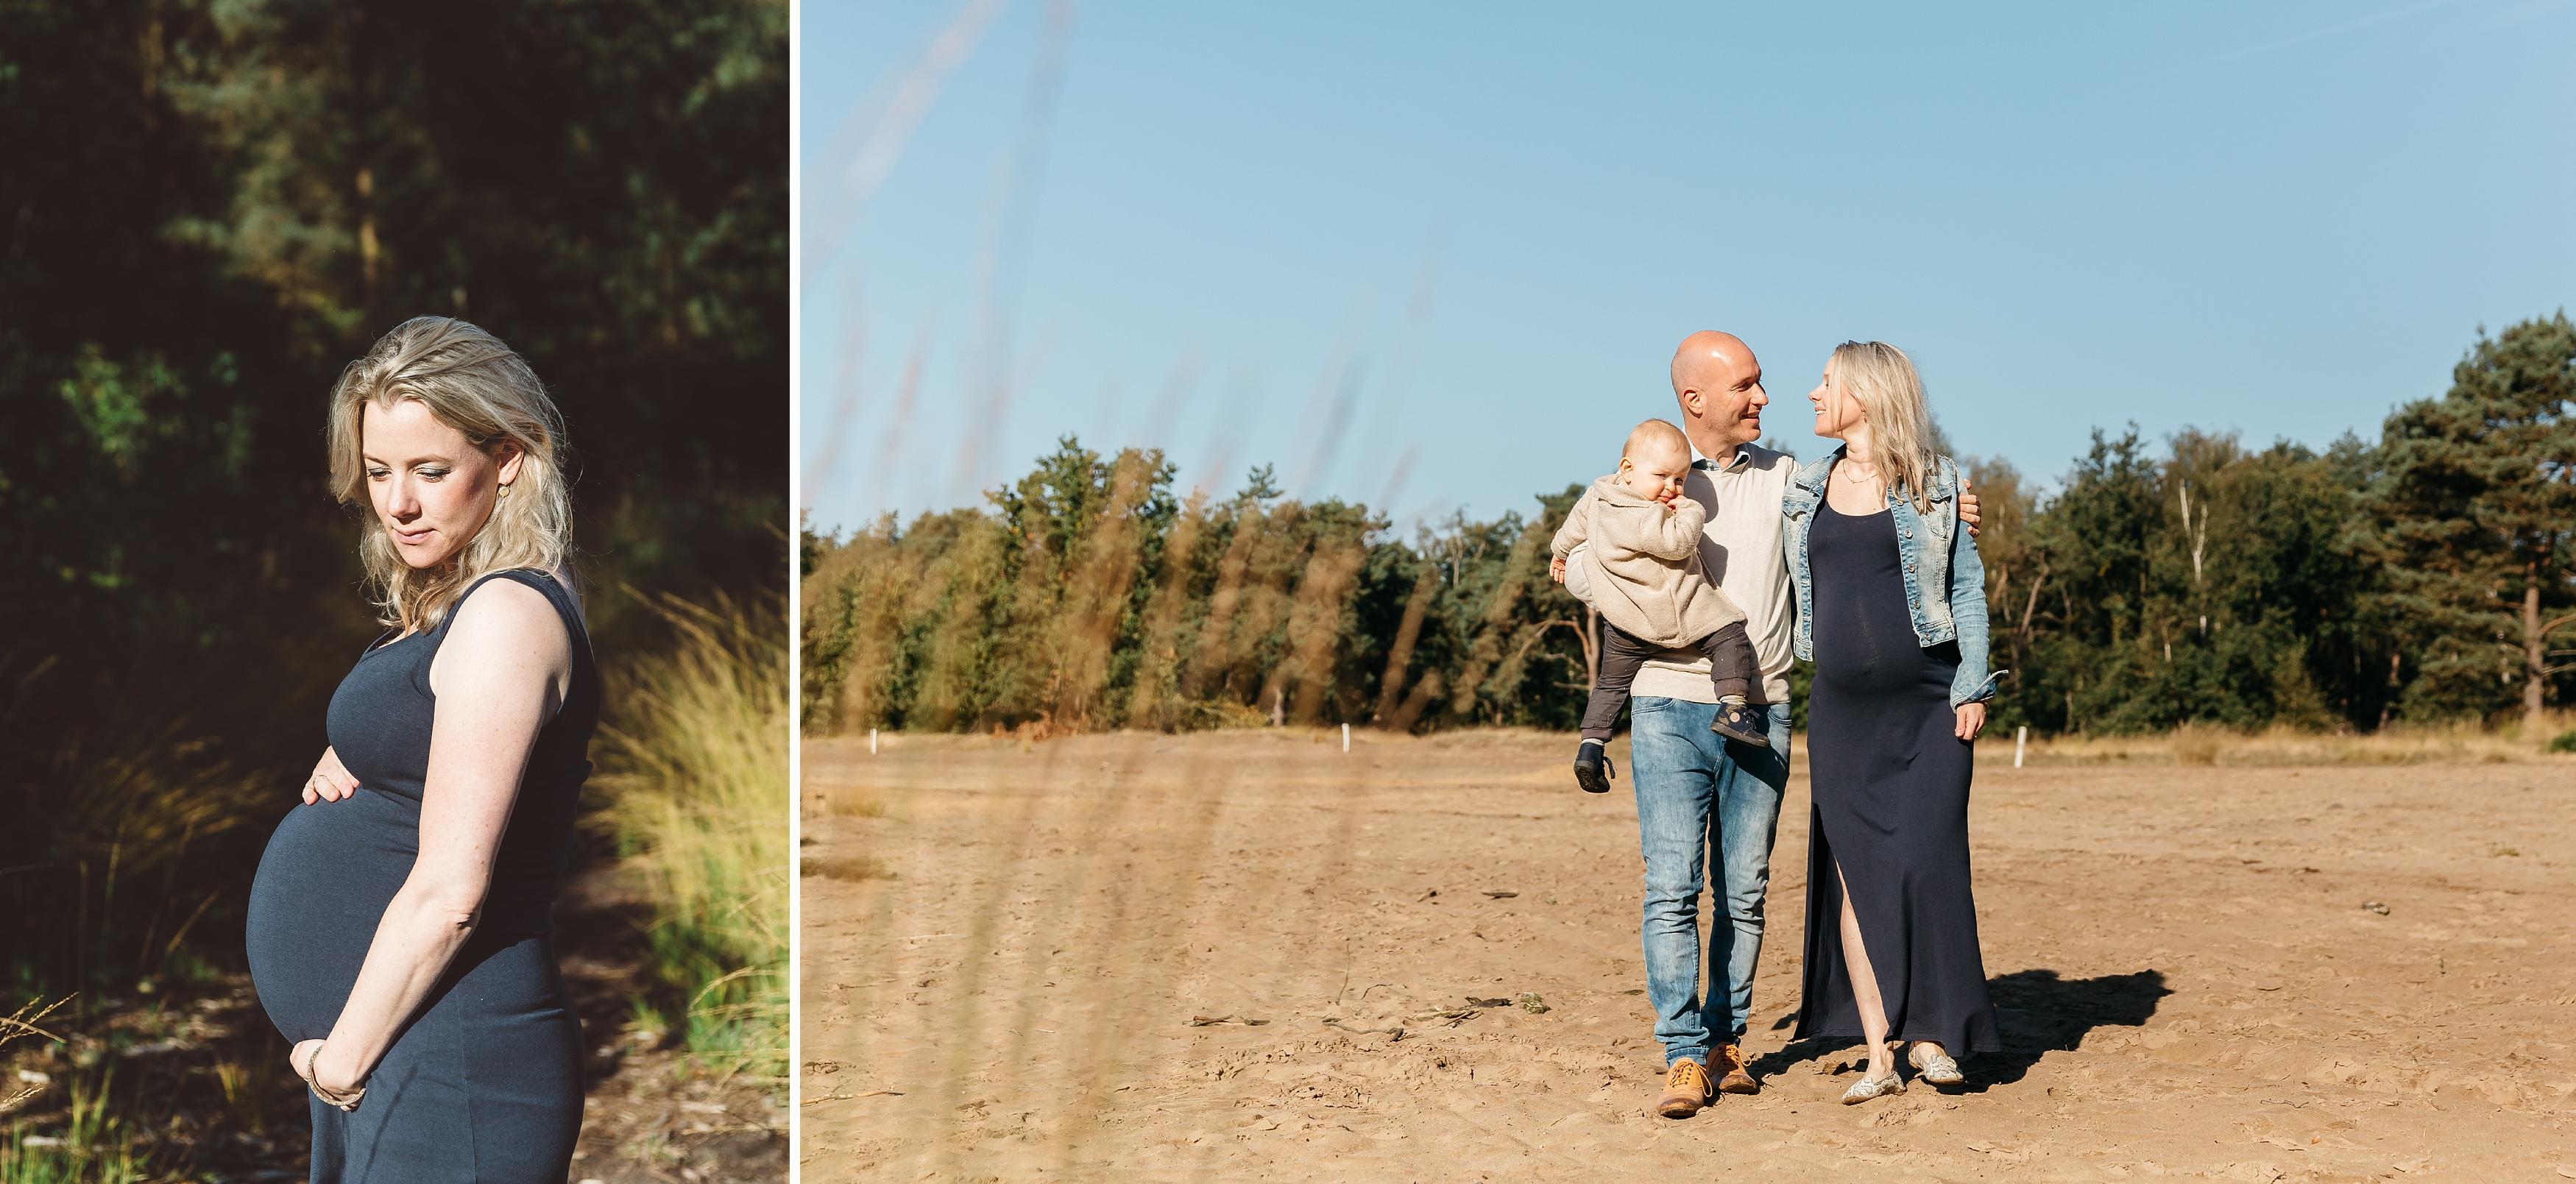 gezinsfotografie zwangerschapsfotografie